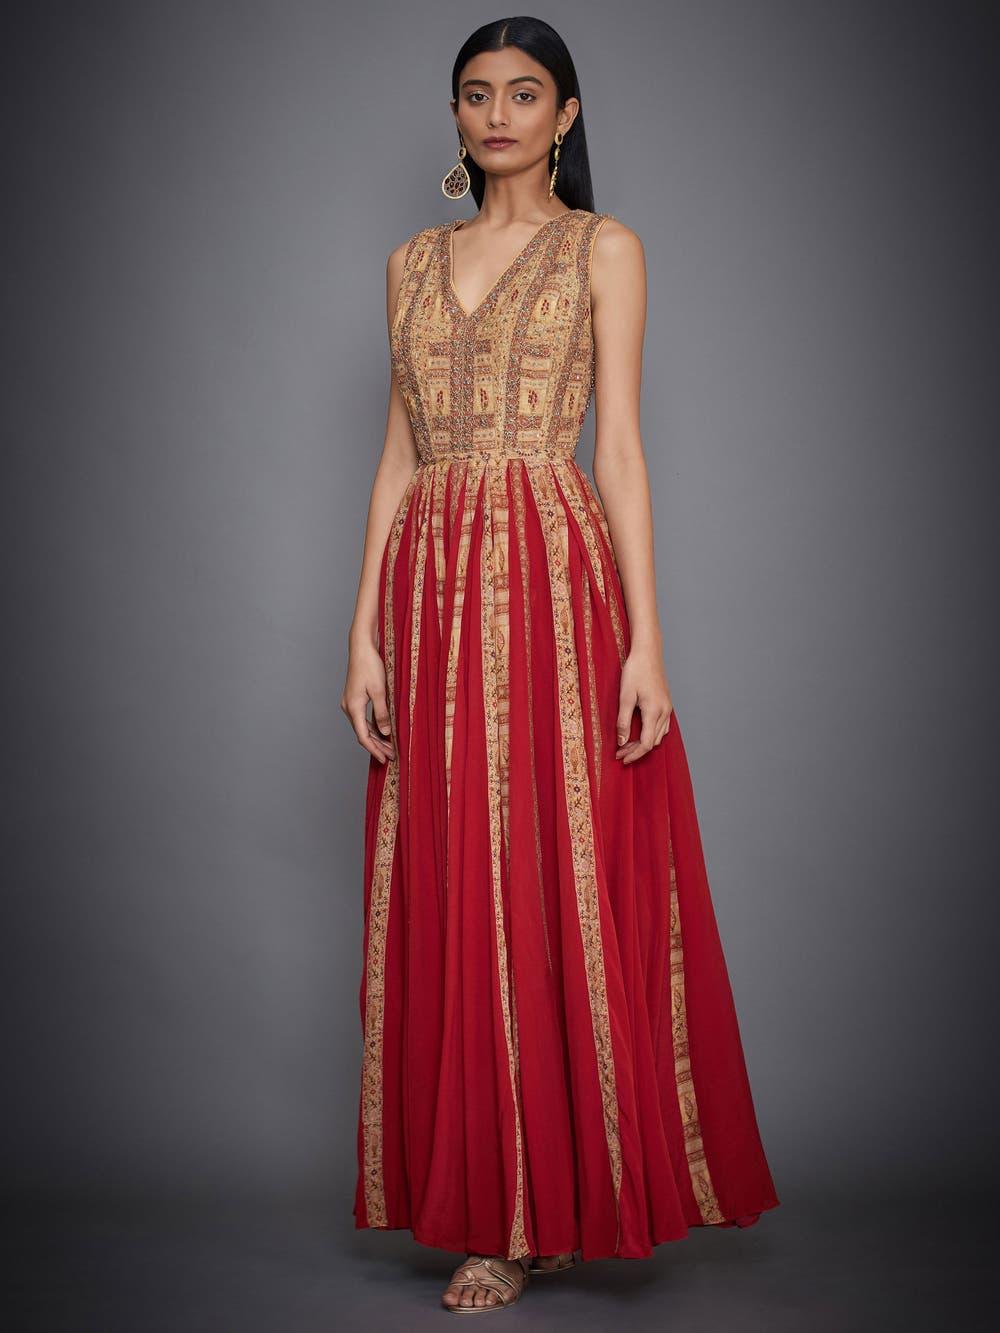 Red & Ochre Zardozi Gown